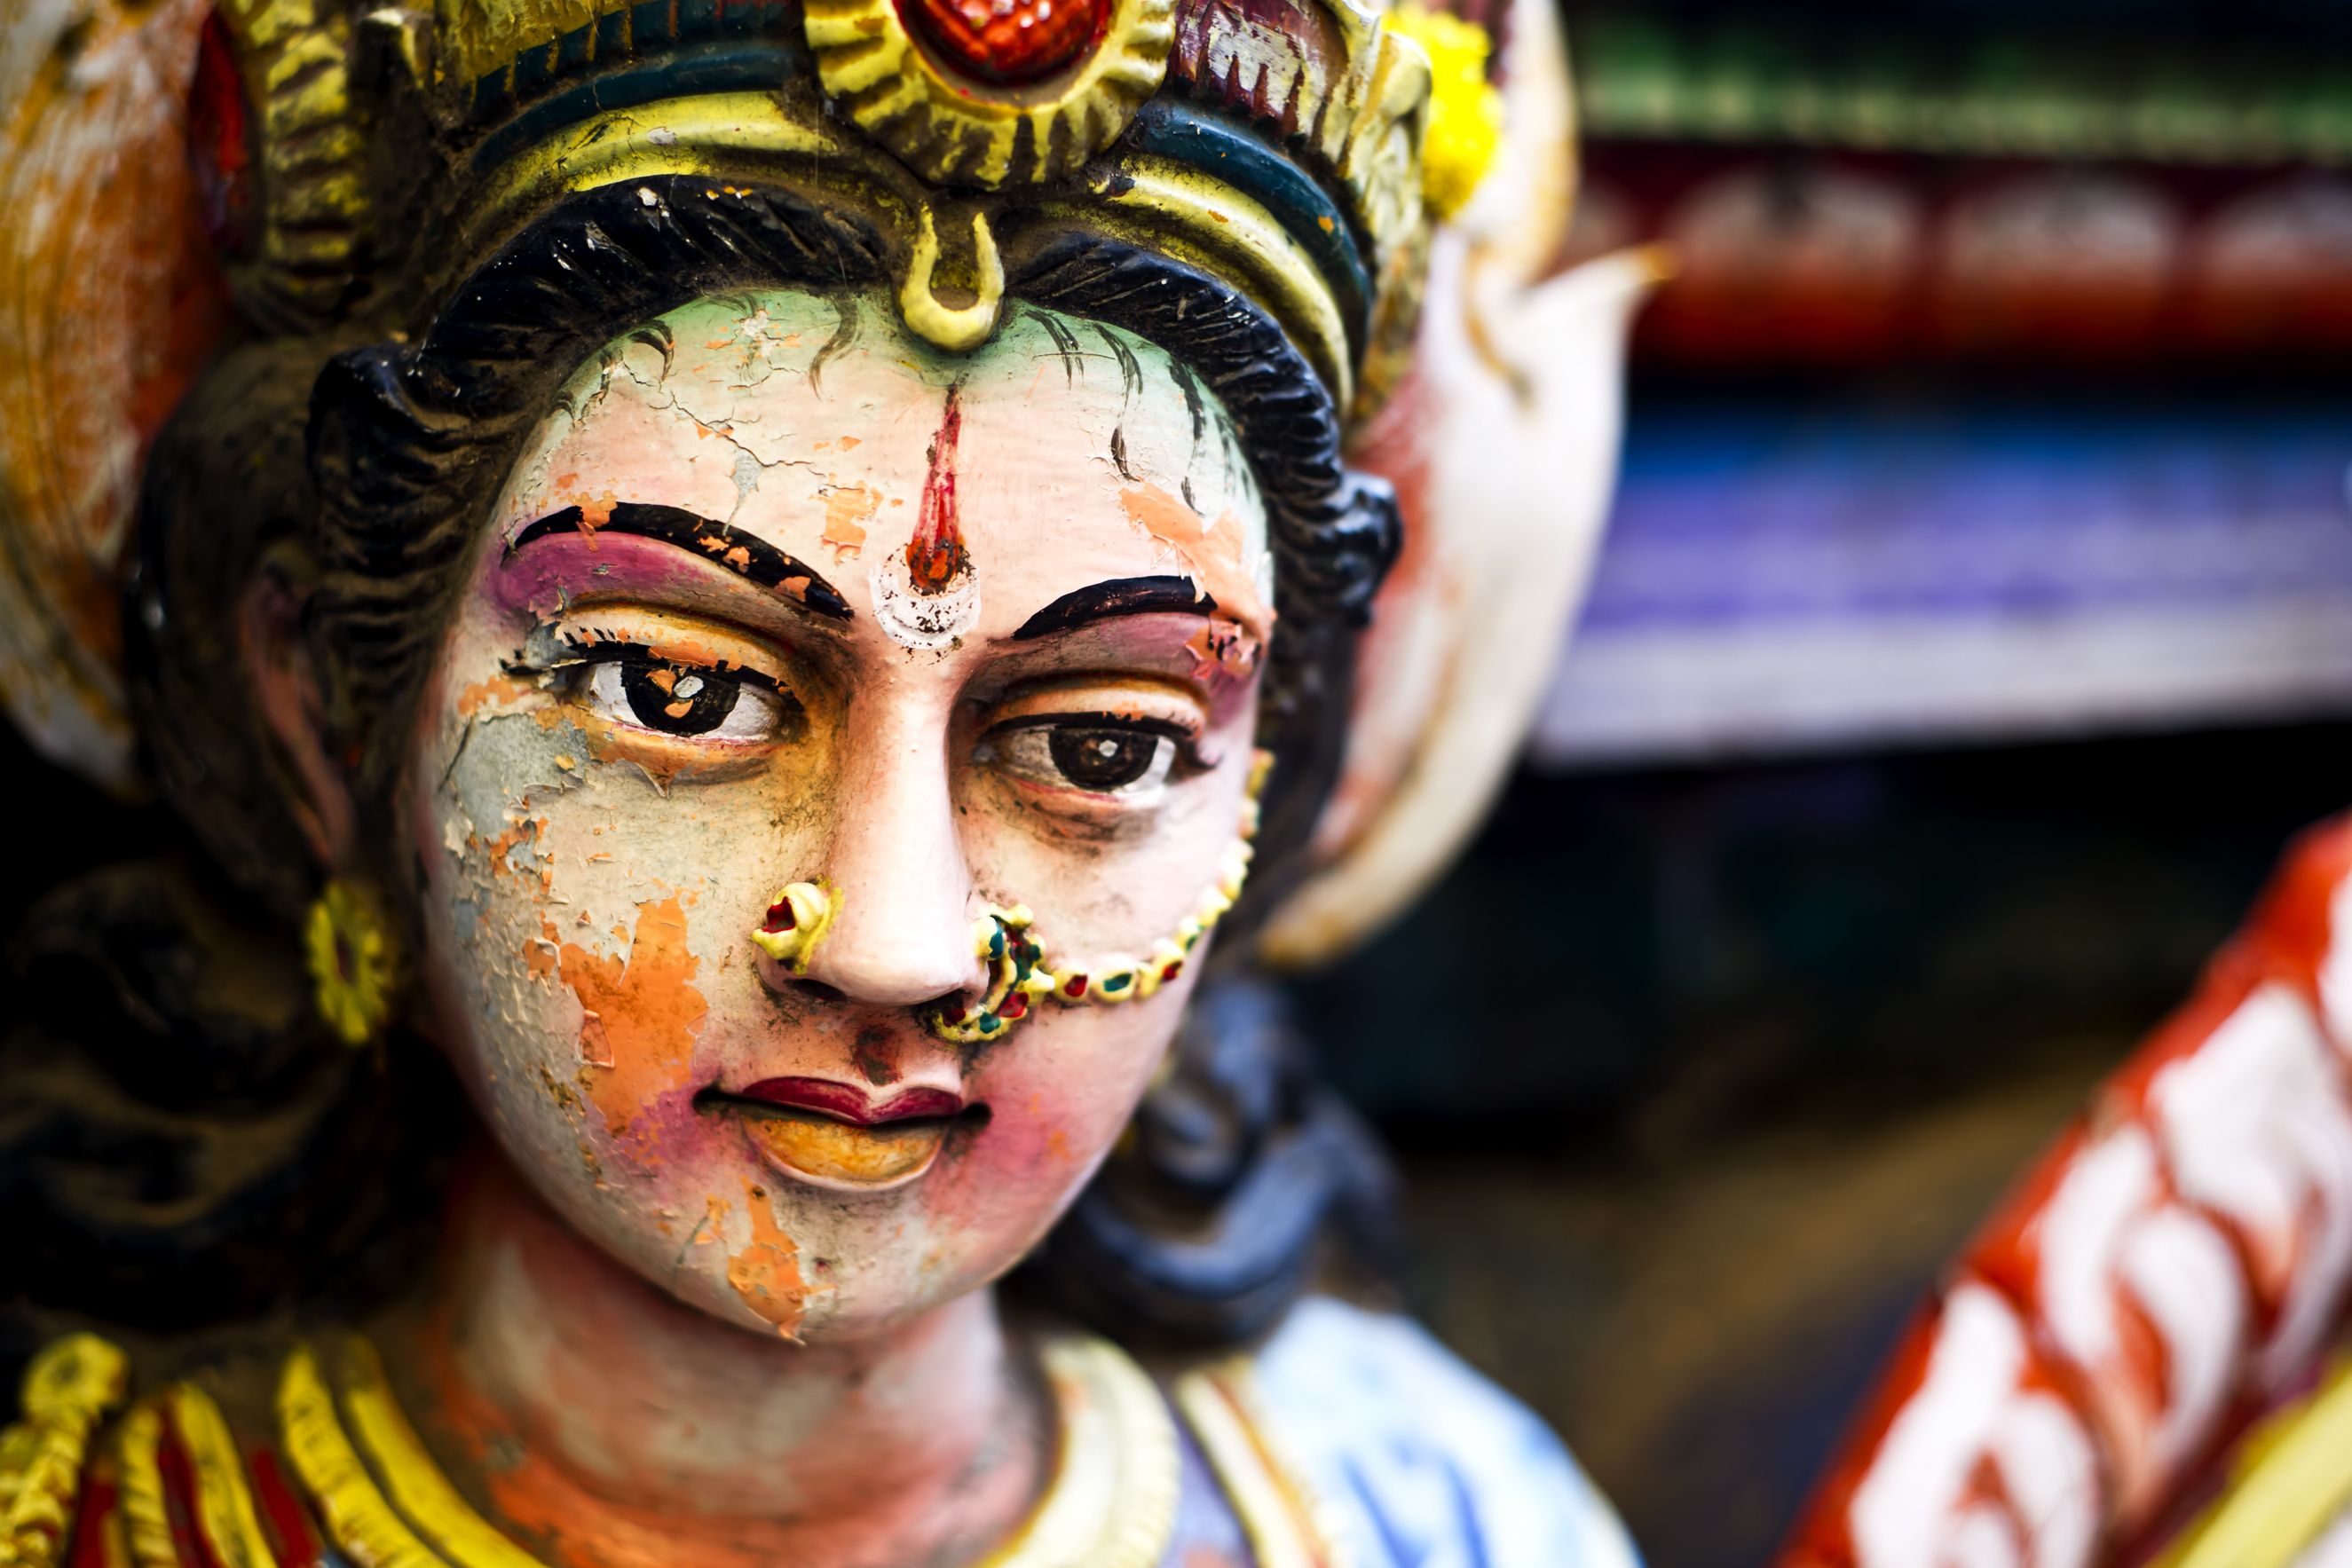 A pandal at Durga Puja.